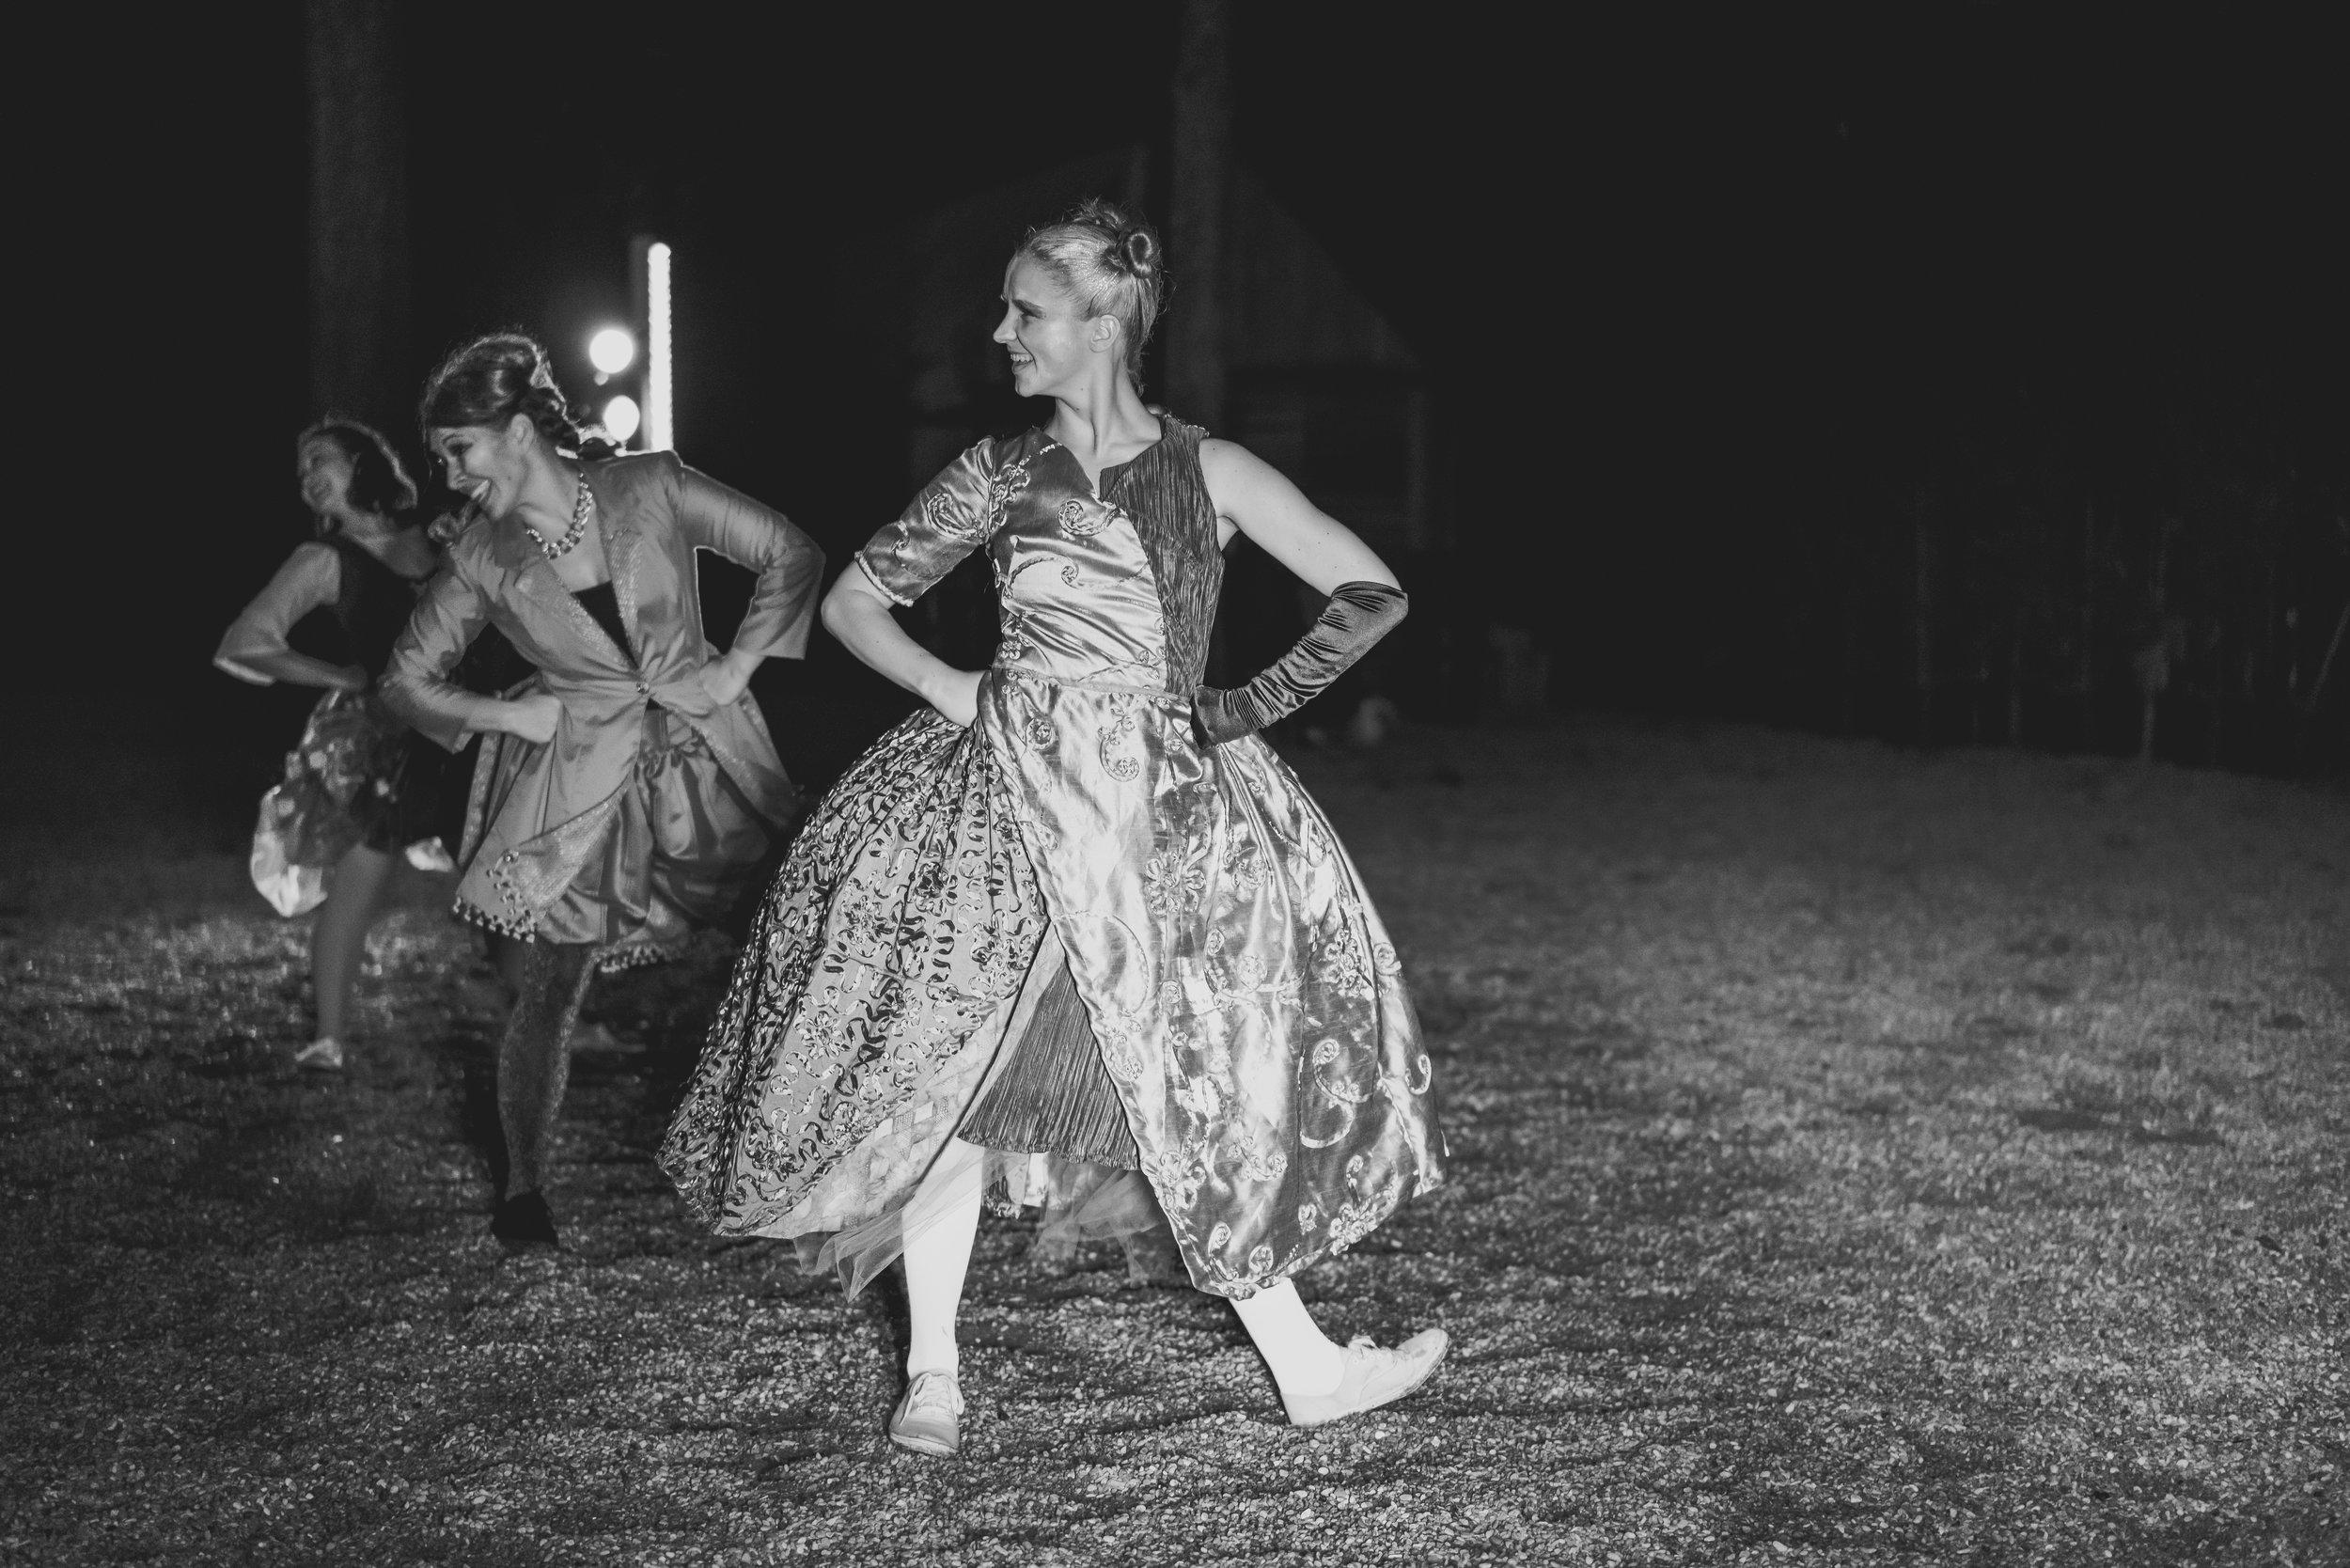 Austin dancers outside black and white photo